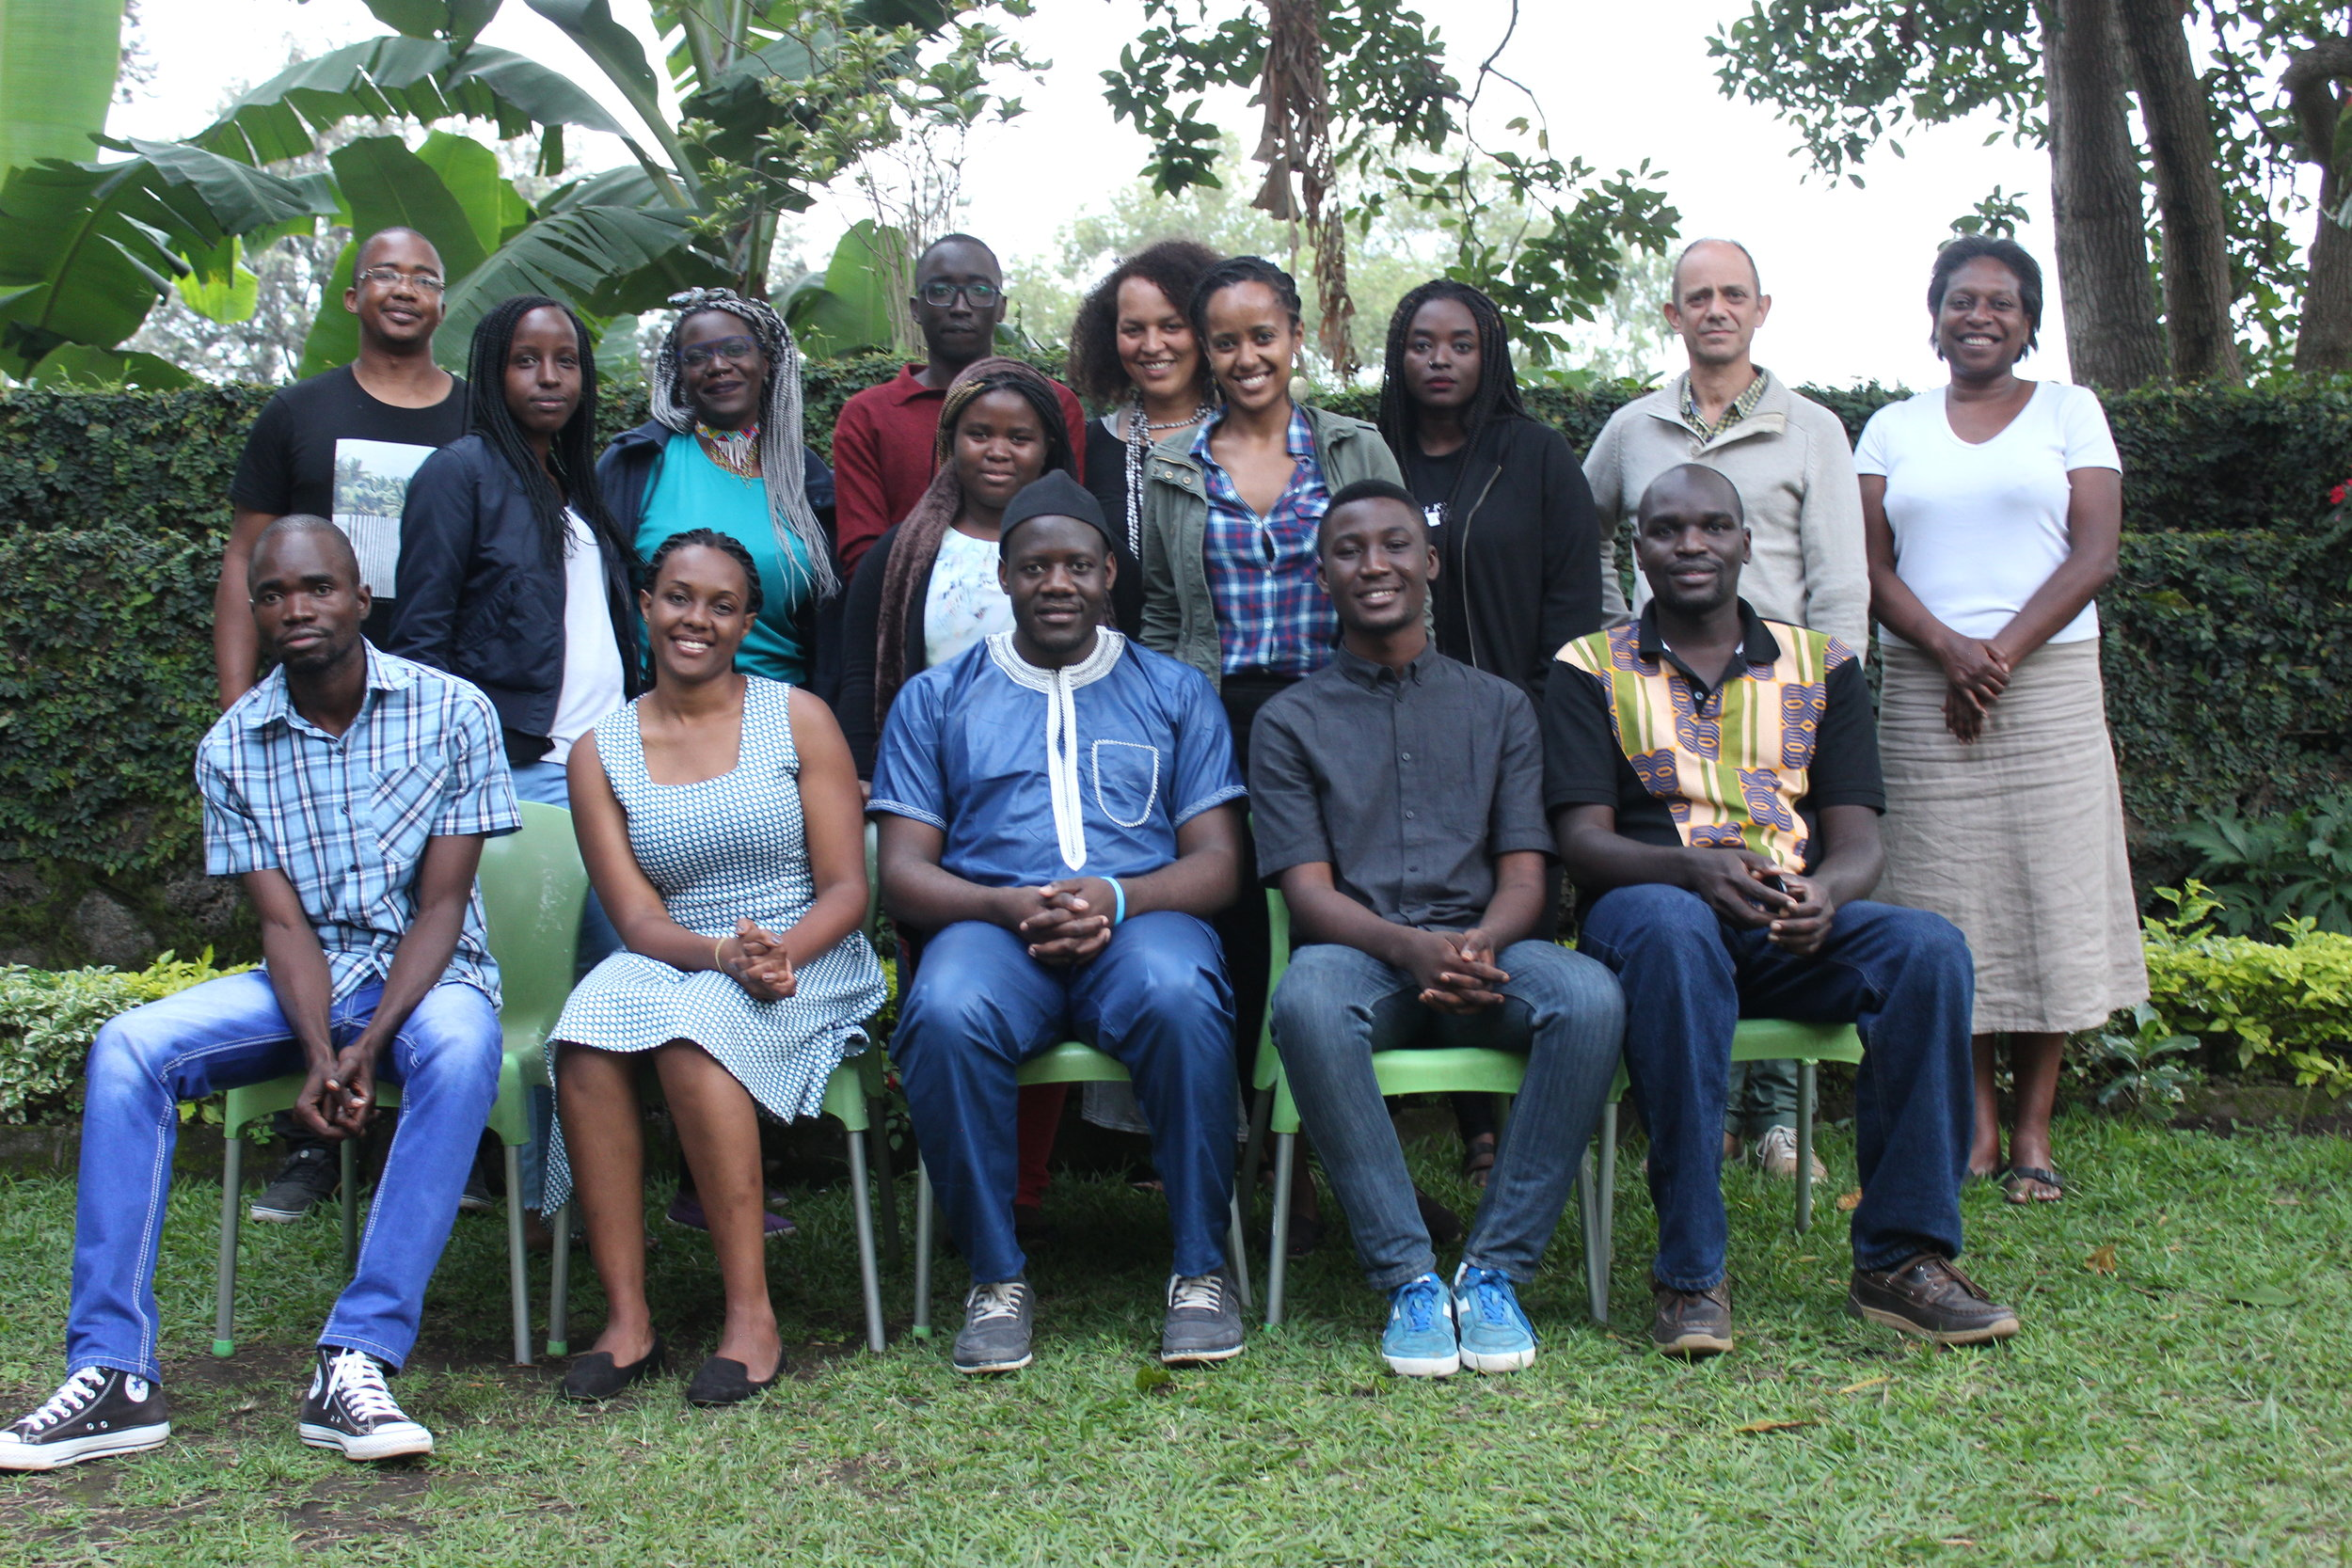 Top row (L-R):   Bongani Kona (Zimbabwe/South Africa), Paula Akugizibwe (Rwanda), Awuor Onyango (Kenya), Troy Onyango (Kenya), Lucky Grace Isingizwe (Rwanda), Vimbai Shire (workshop coordinator), Heran Abate (Ethiopia), Eloghosa Osunde (Nigeria), Damon Galgut (workshop facilitator) and Elise Dillsworth (workshop facilitator).    Bottom row (L-R):   Bongani Sibanda (Zimbabwe), Caroline Numuhire (Rwanda), Nsah Mala (Cameroon), Arinze Ifeakandu (Nigeria) and Dilman Dila (Uganda).